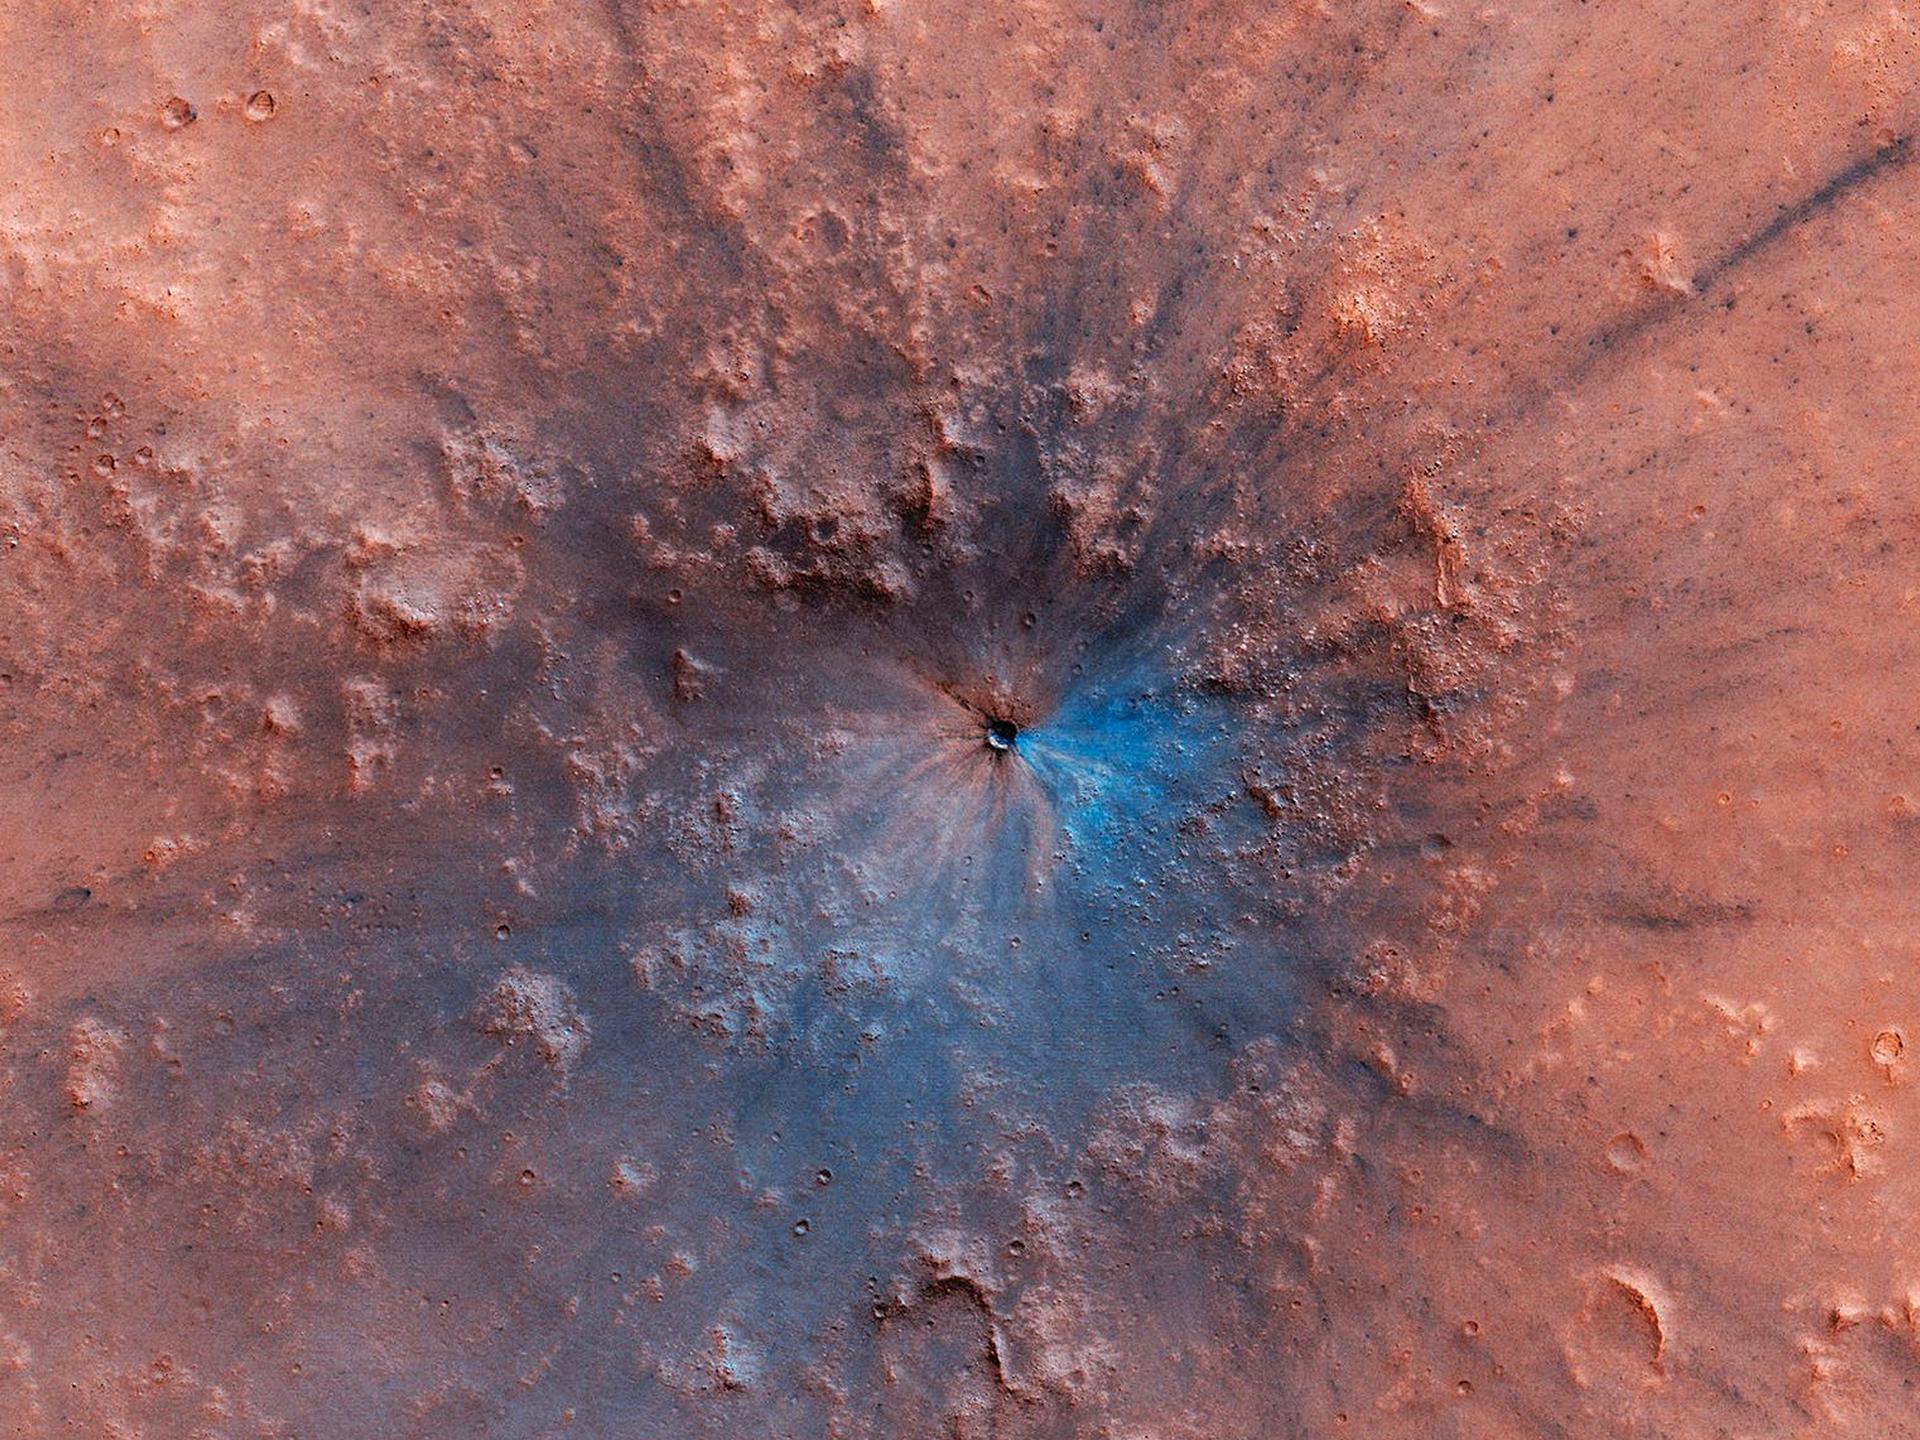 На Марсе найден новый кратер